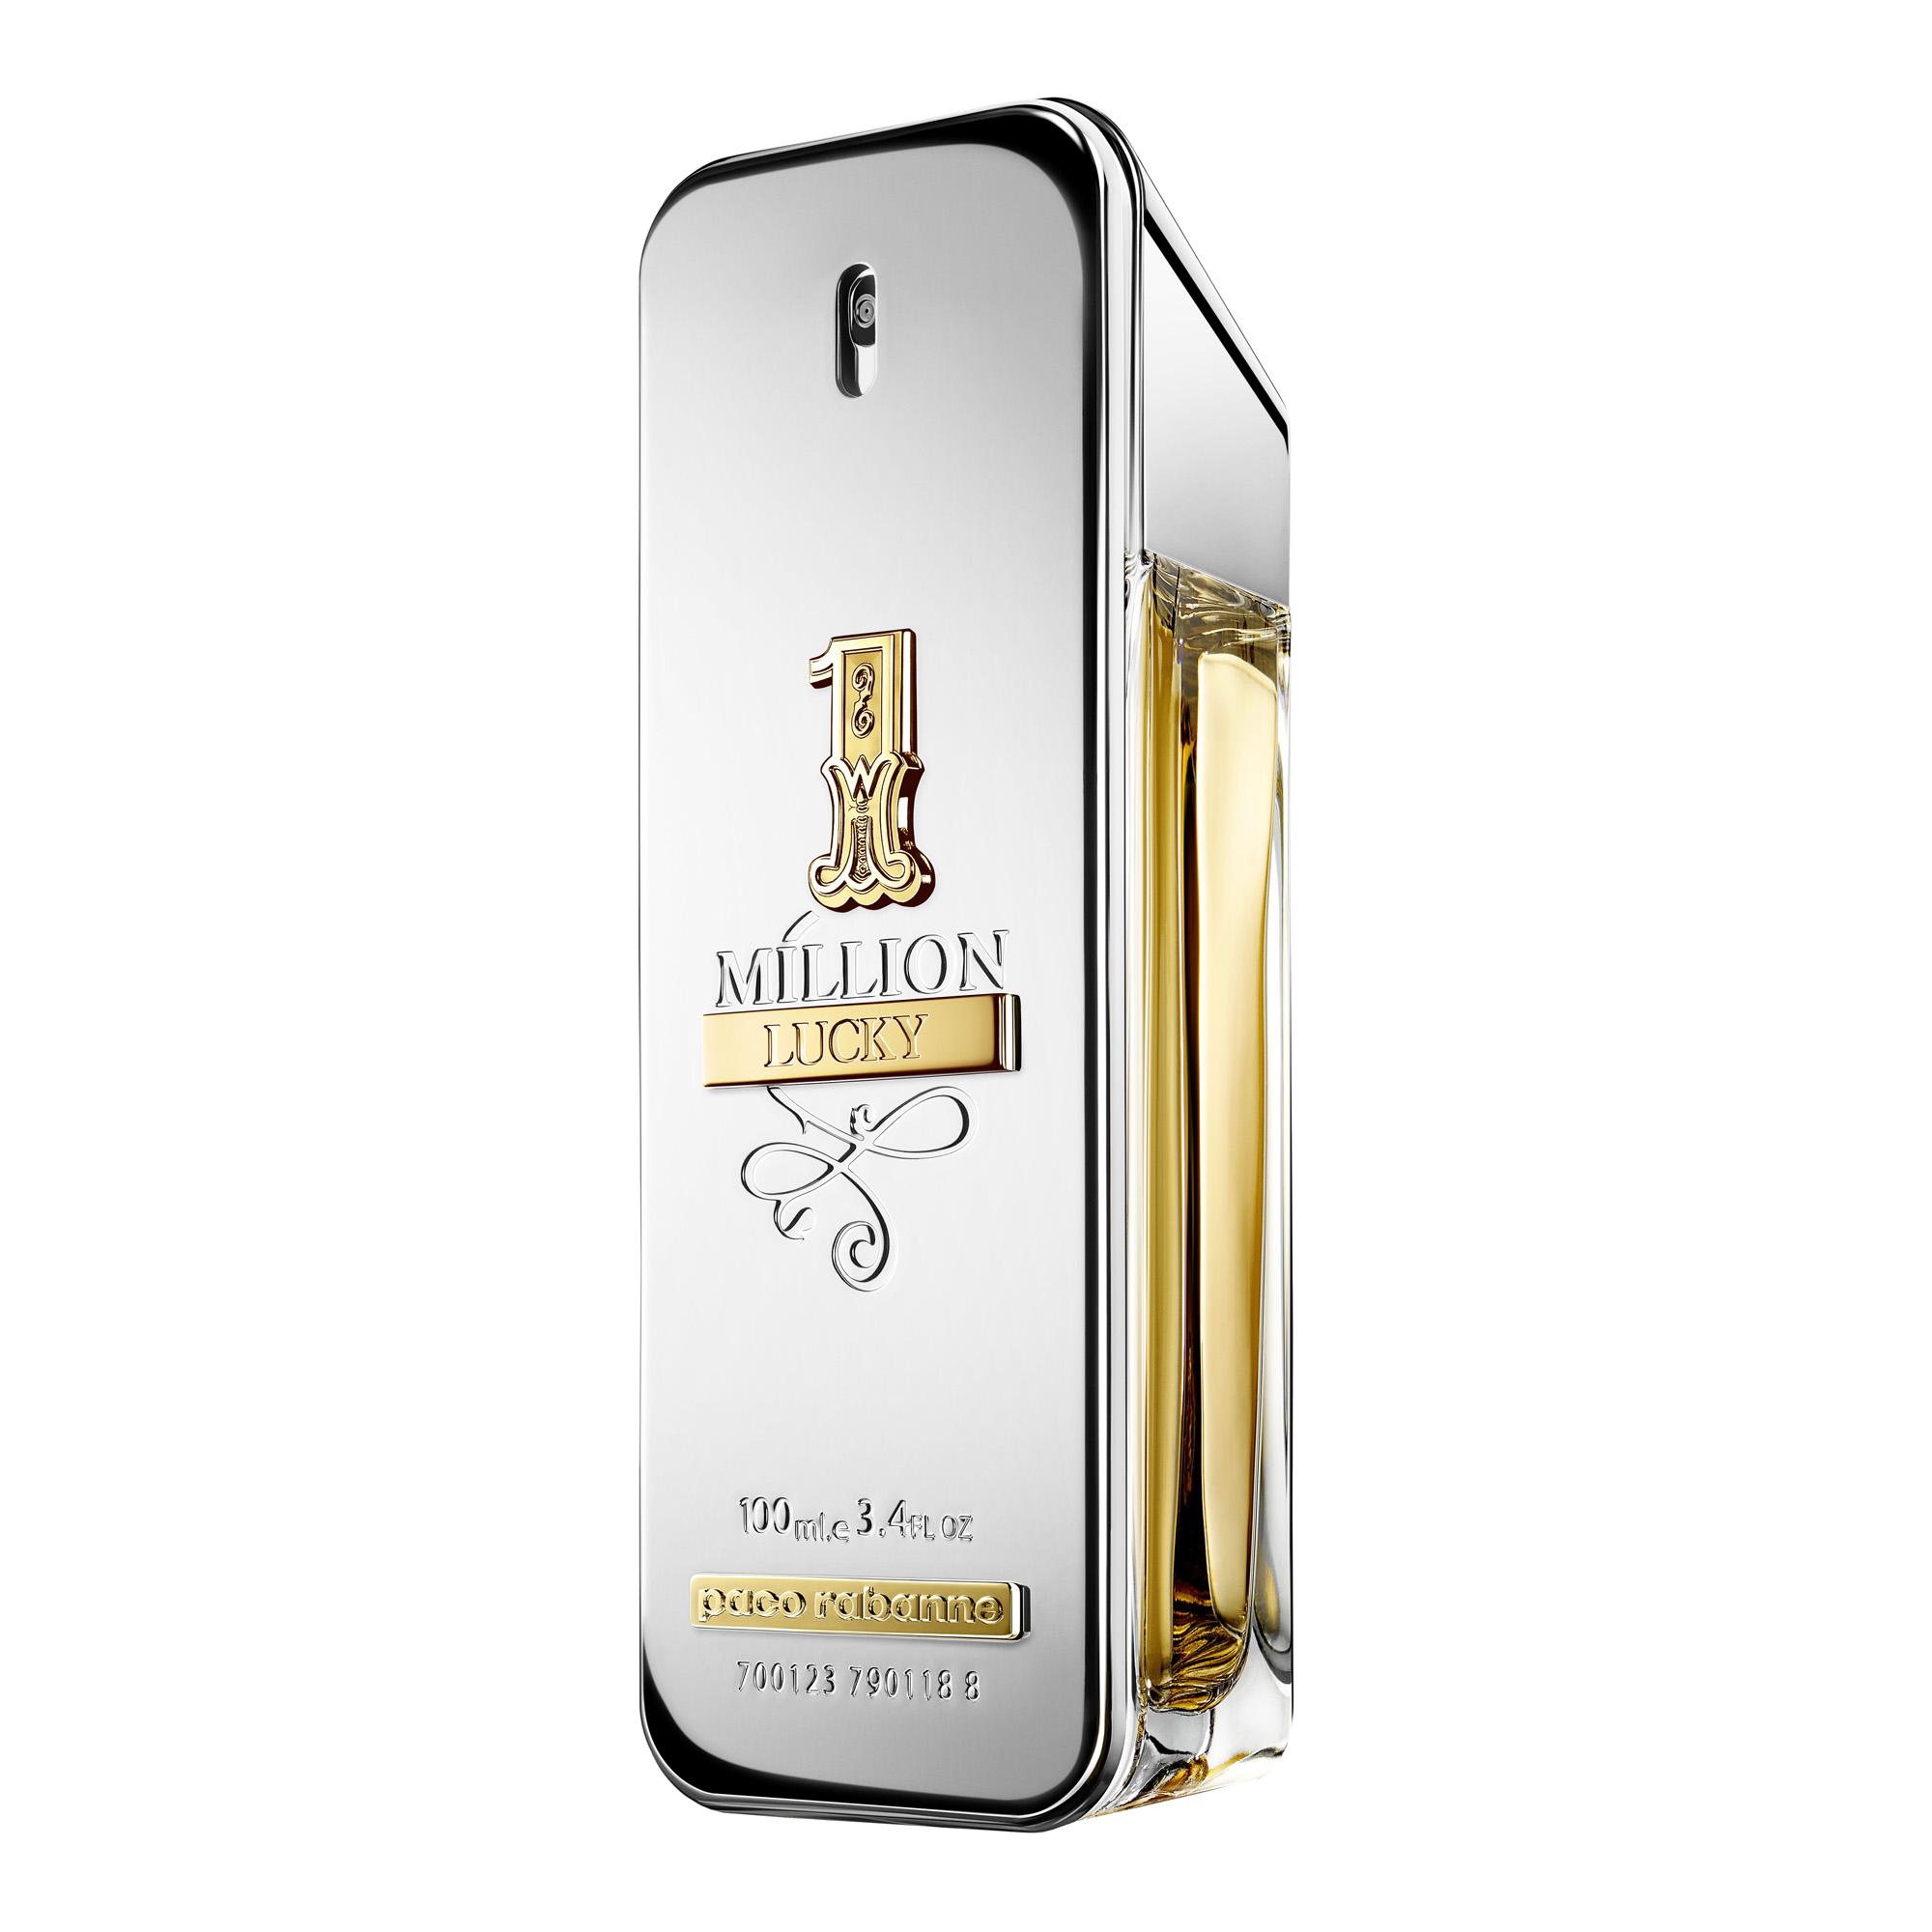 b8e32967e10 1 Million Lucky EdT 50ml - Meeste lõhnad - Meeste kosmeetika - Ilu